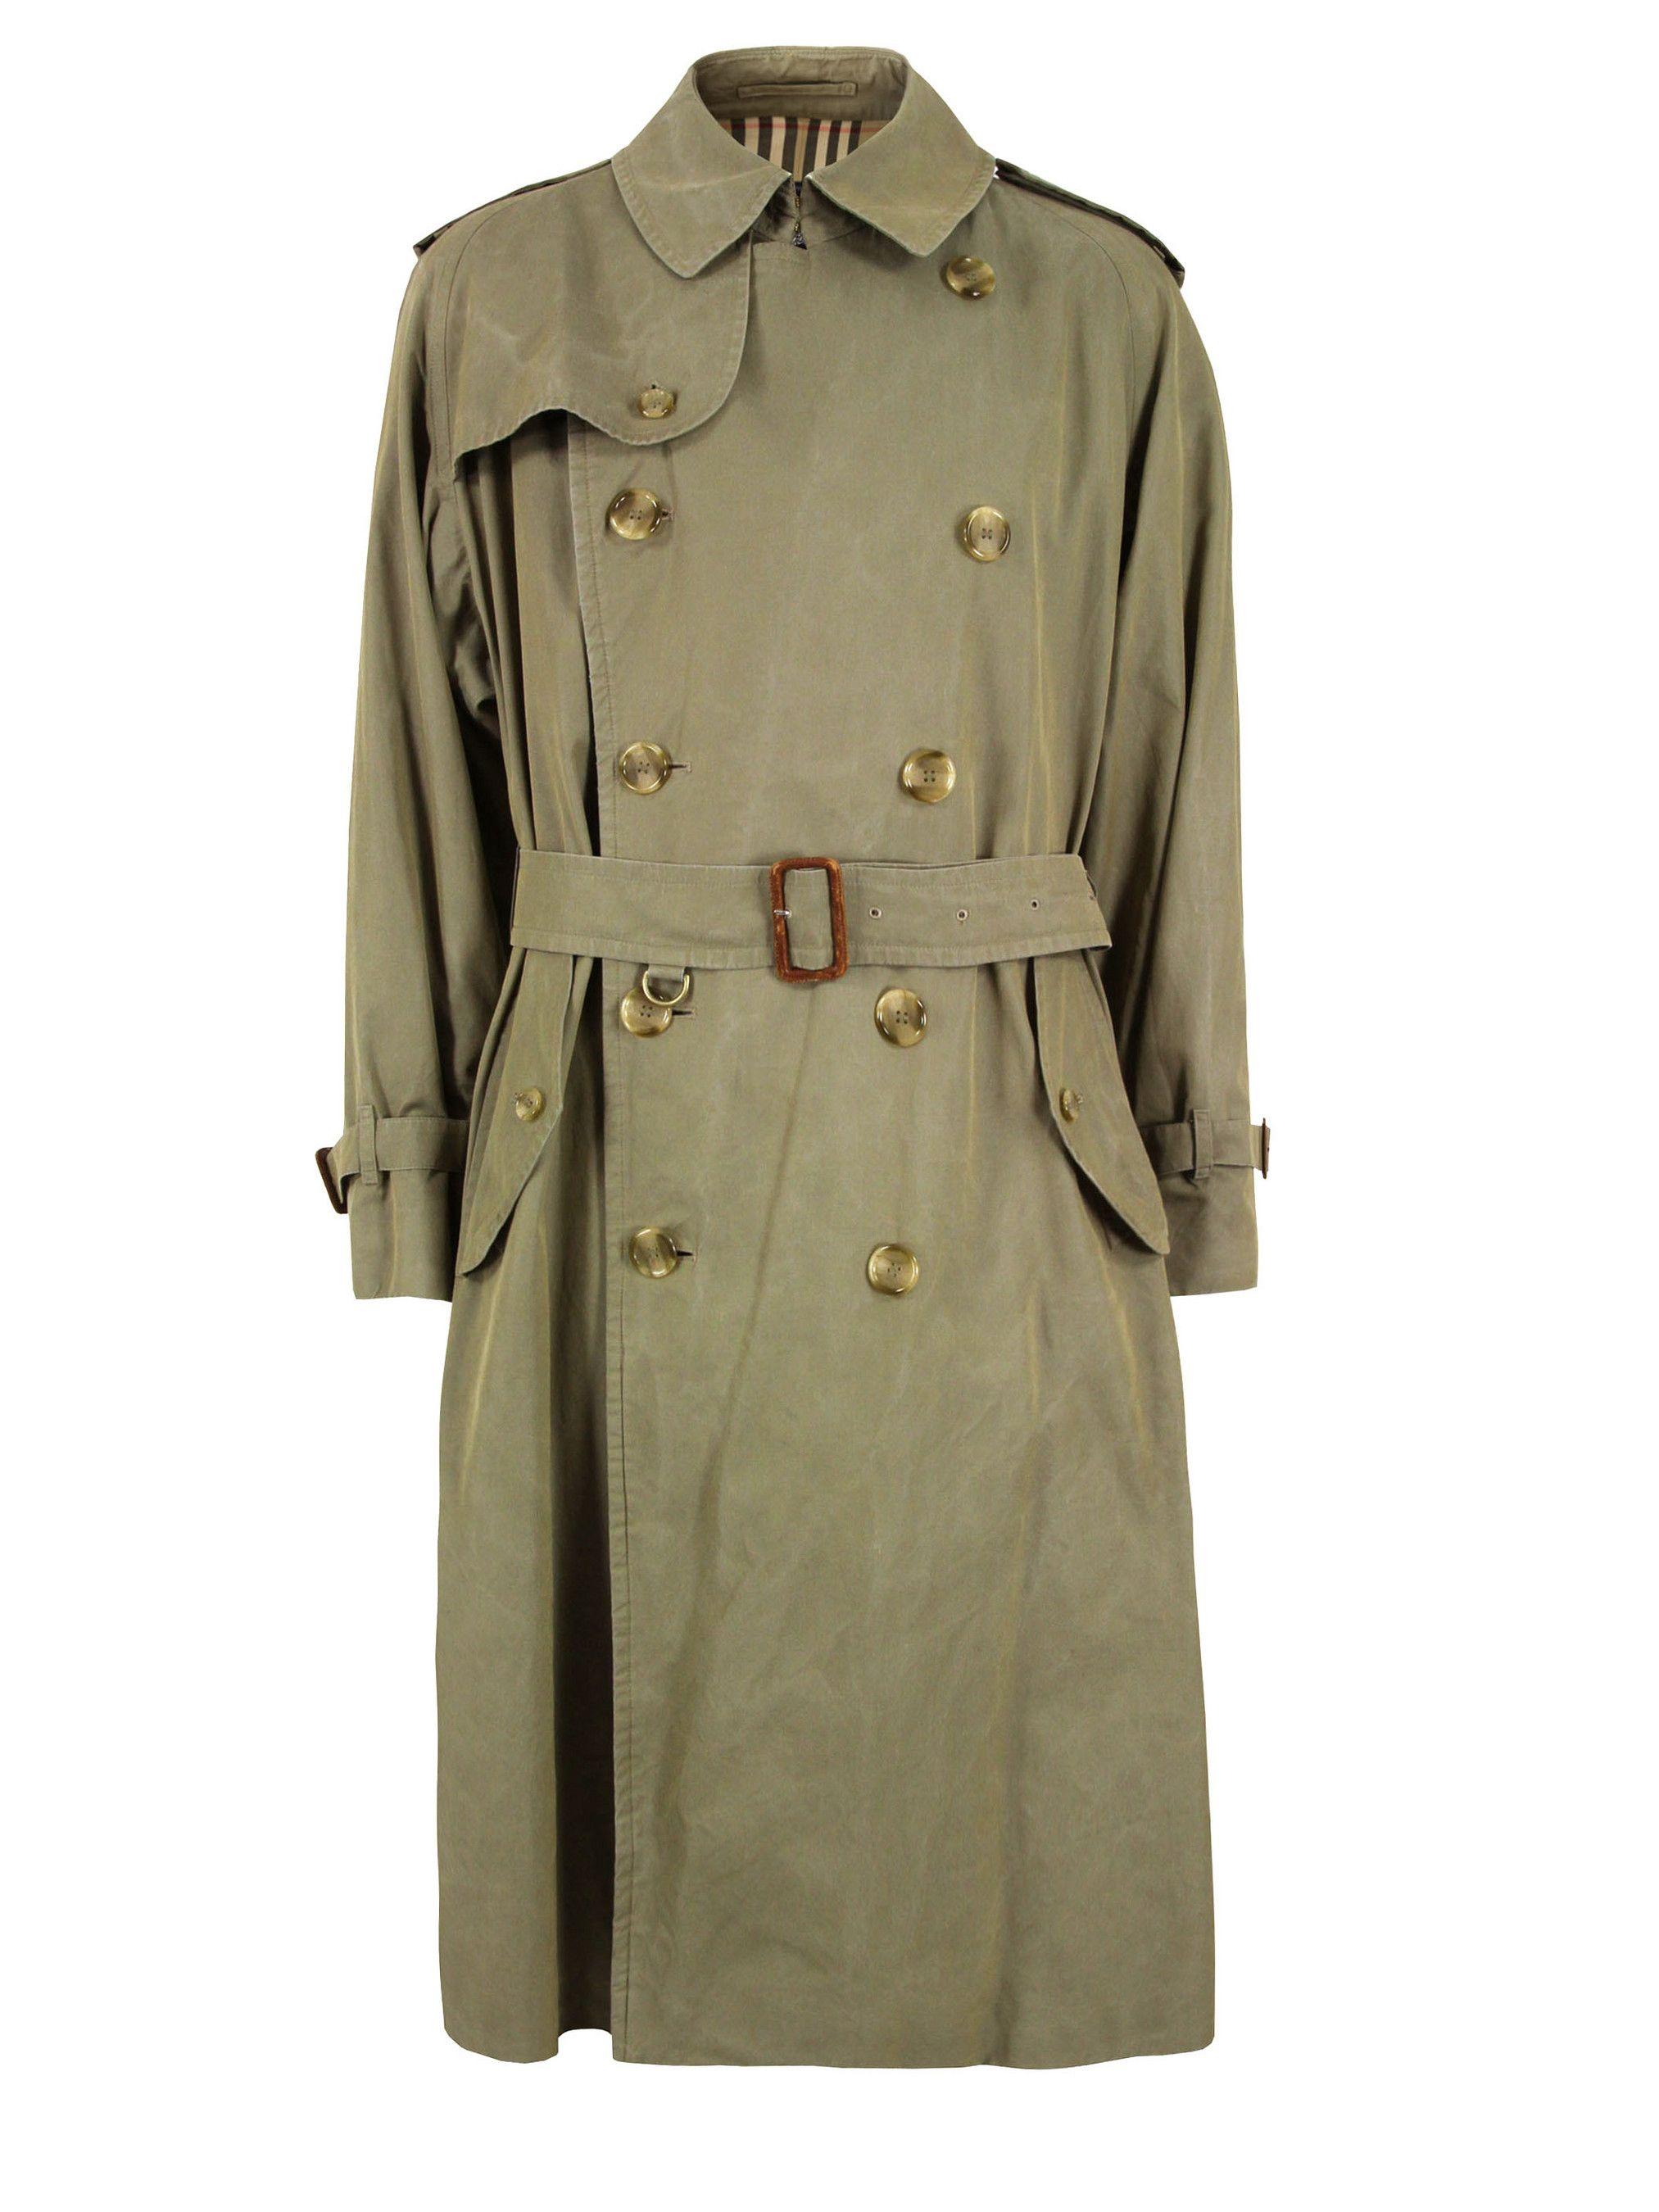 Vintage-Mens-Military-Burberry-Stone-Coat | Military ...